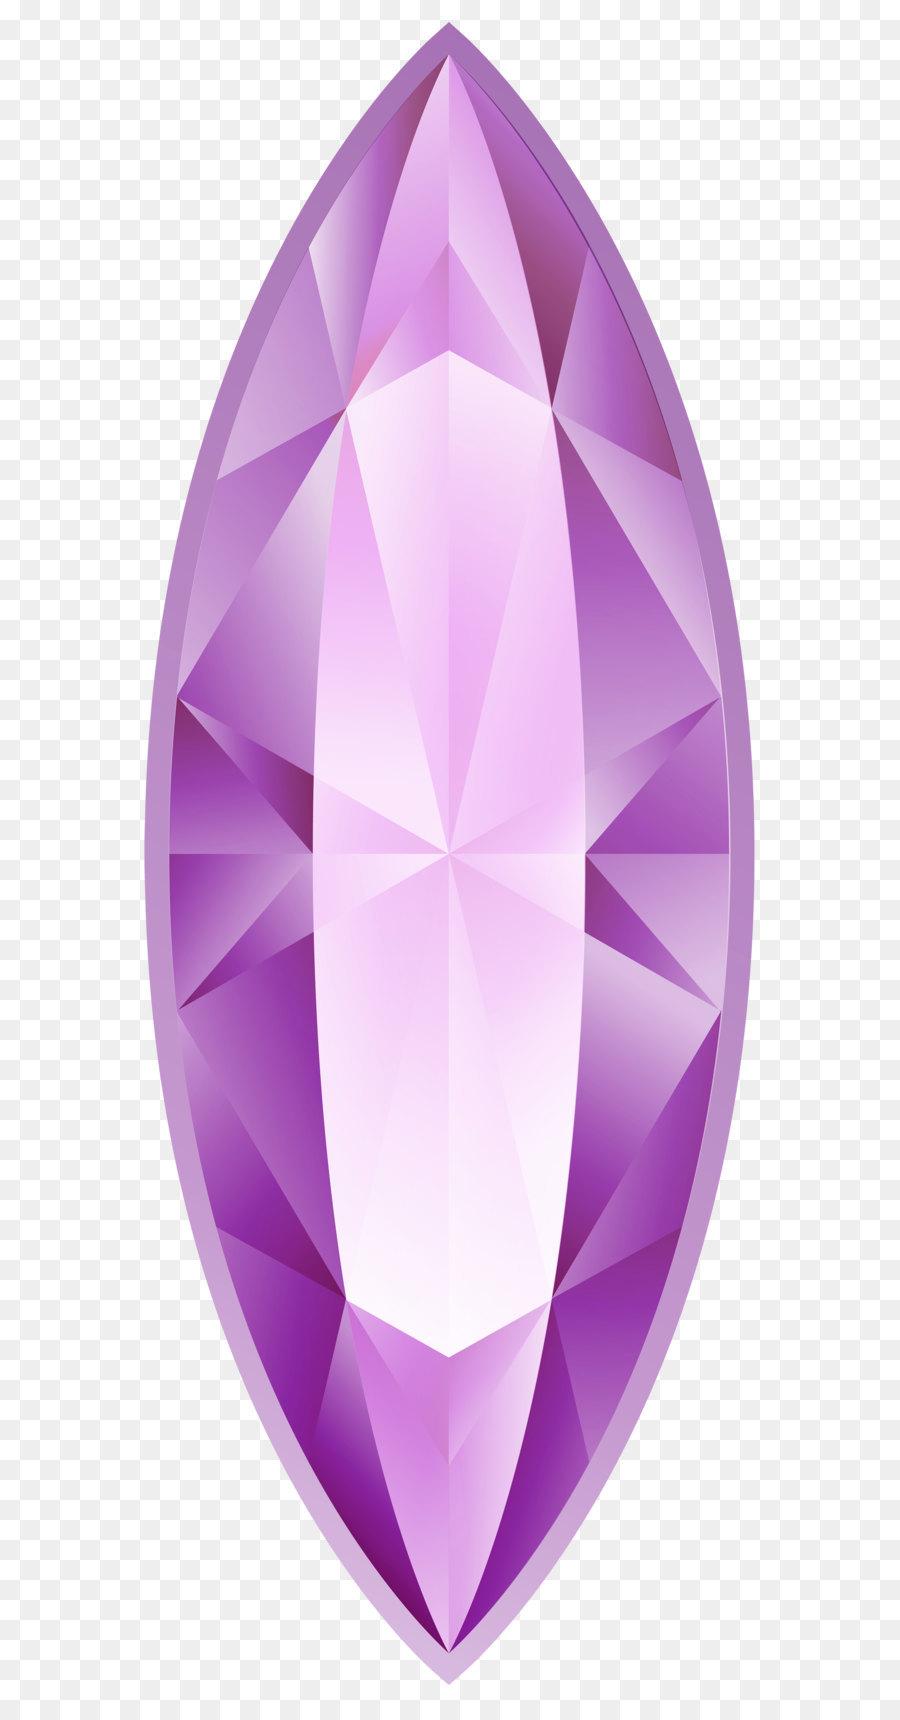 Purple Diamond Clip art - Purple Diamond PNG Clip Art Image png ...